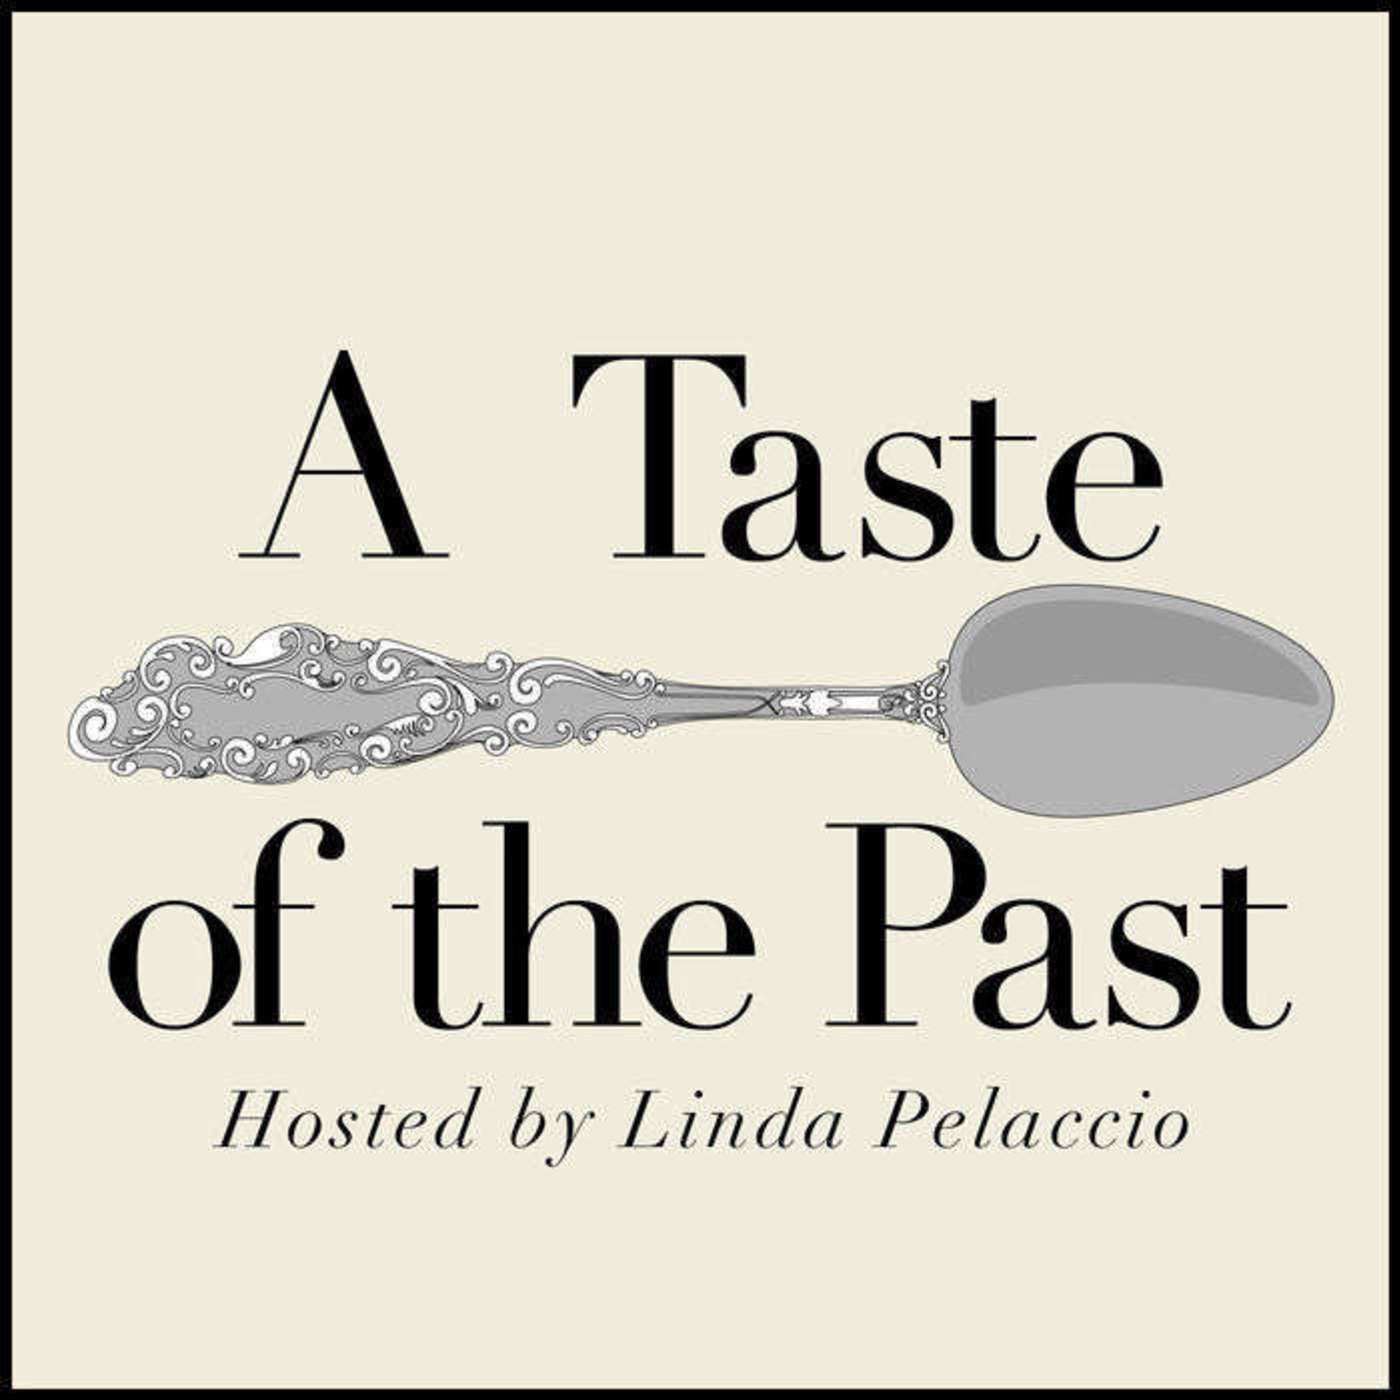 Episode 180: The Food History Reader